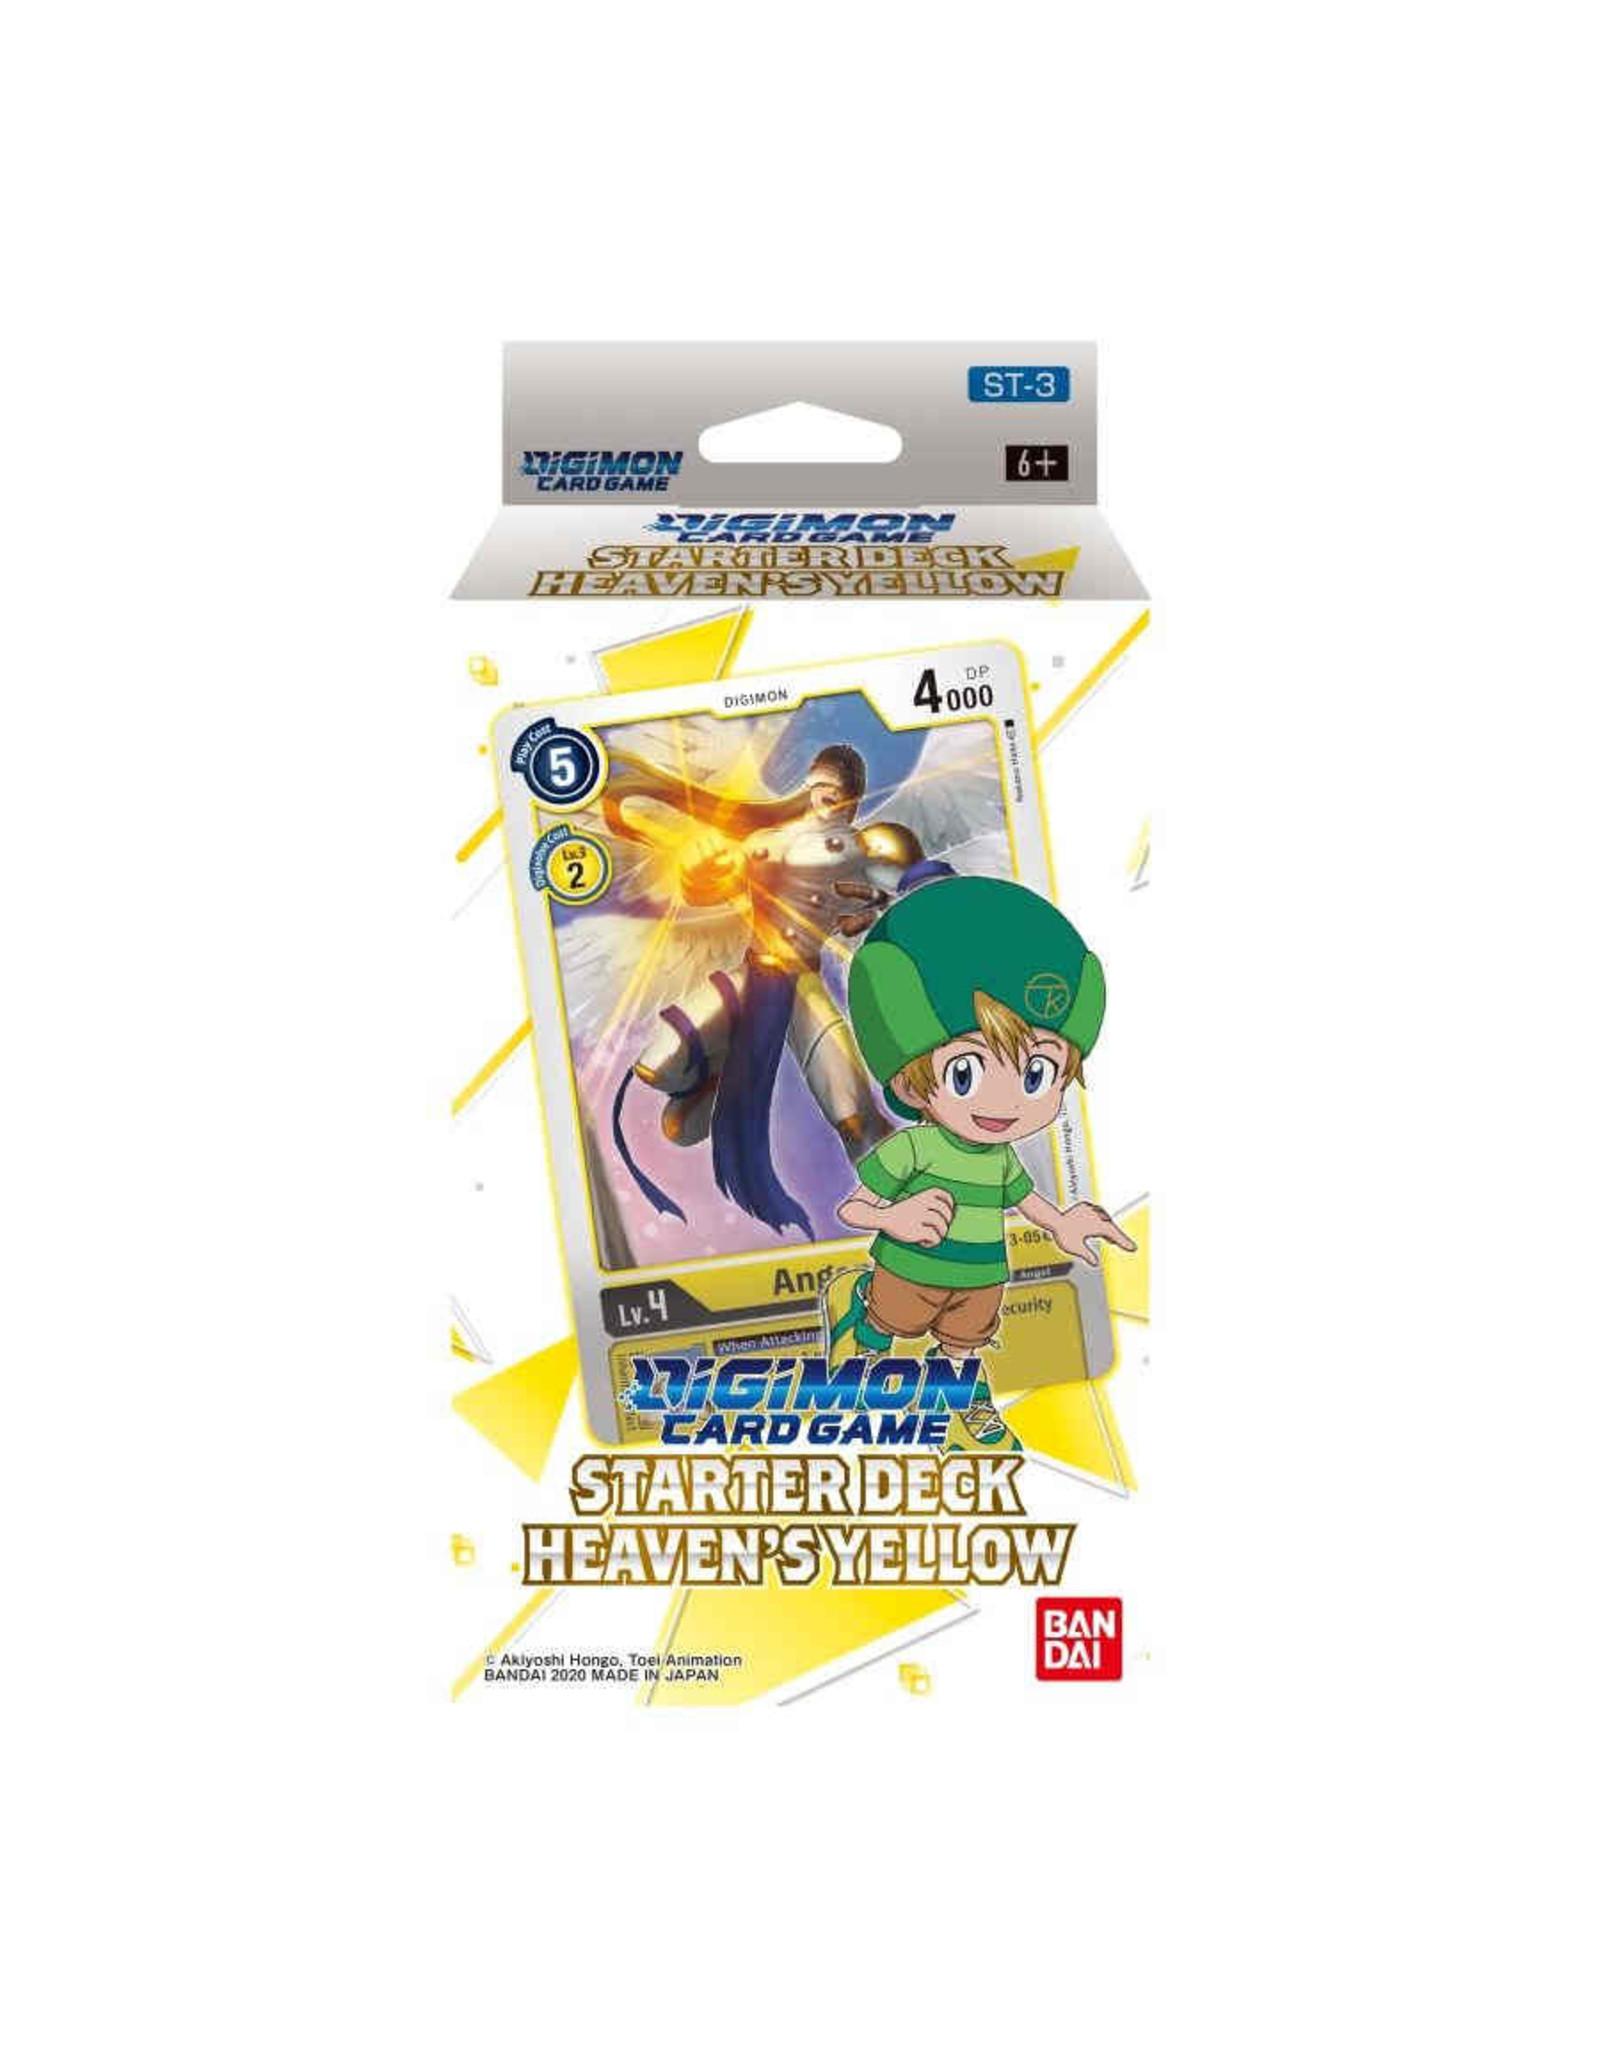 Bandai Digimon Card Game Starter Deck Heavens Yellow